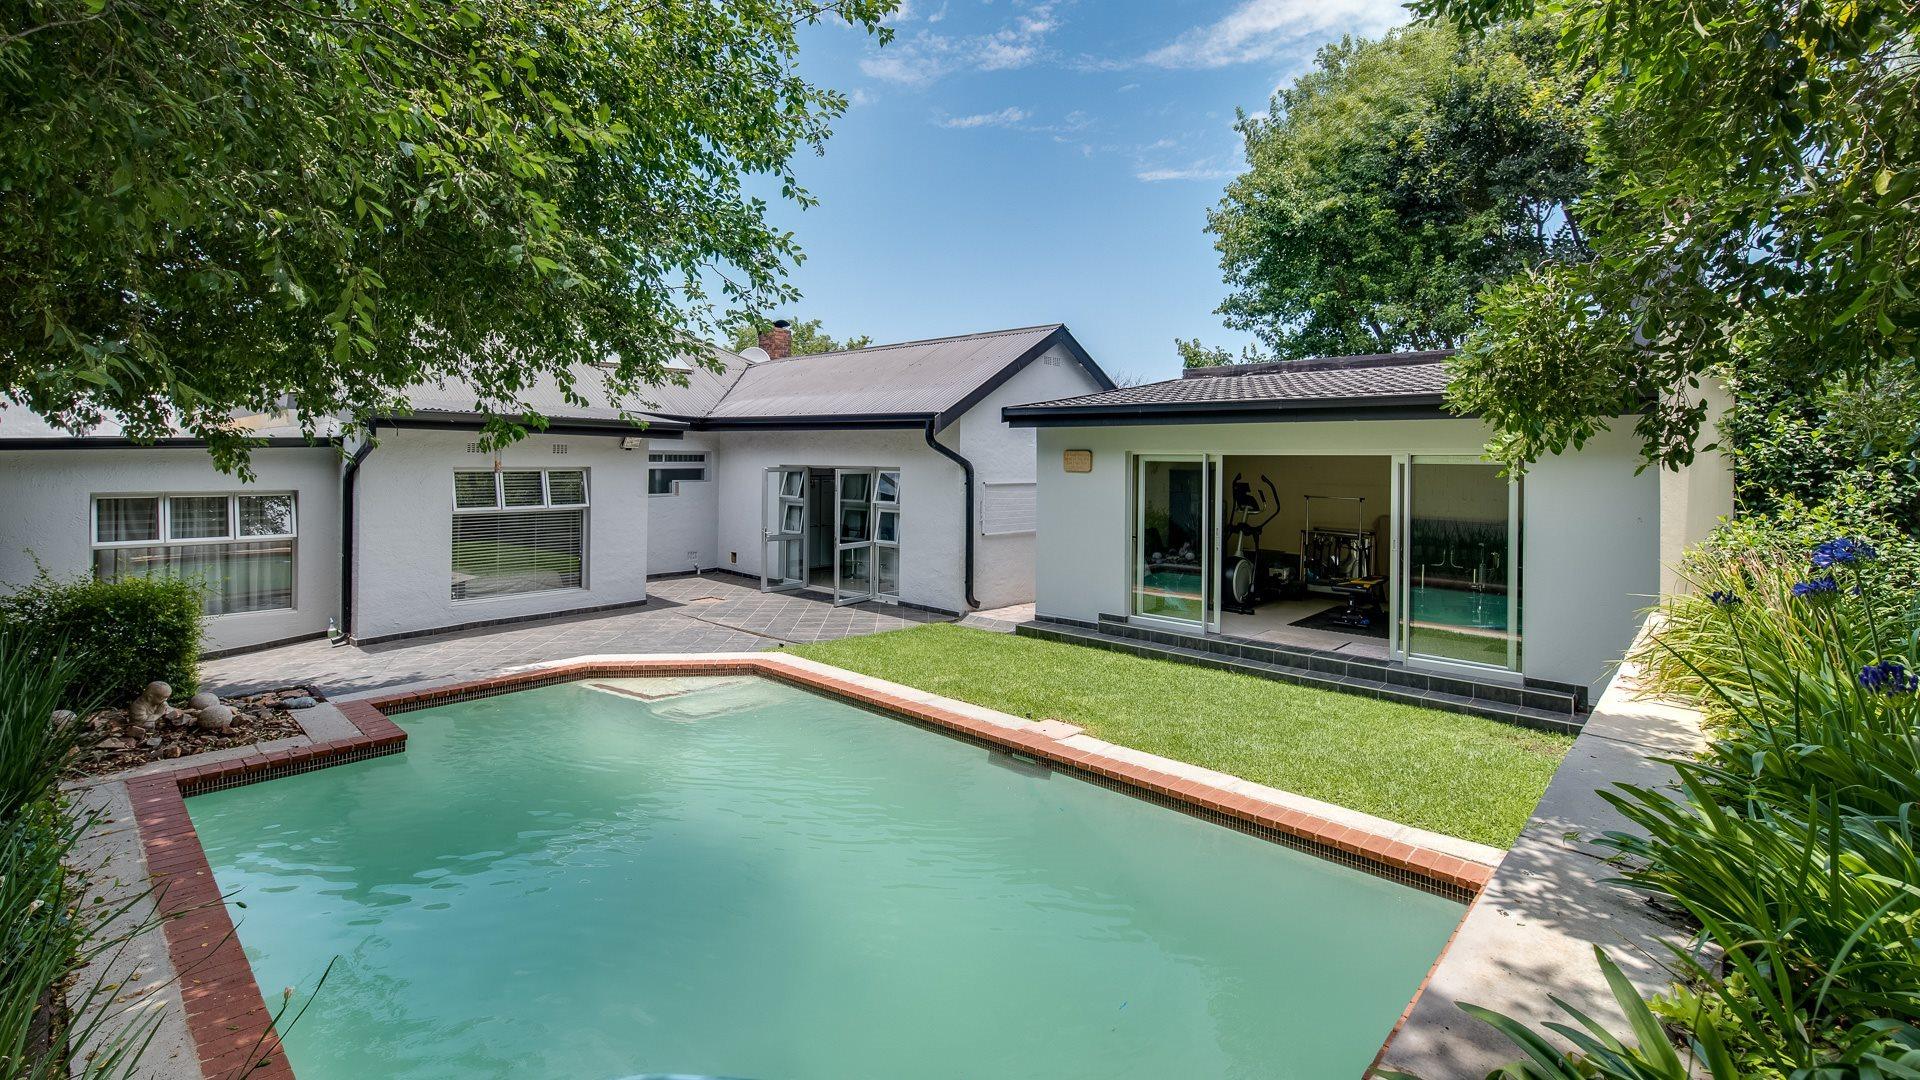 , House, 2 Bedrooms - ZAR 2,599,000